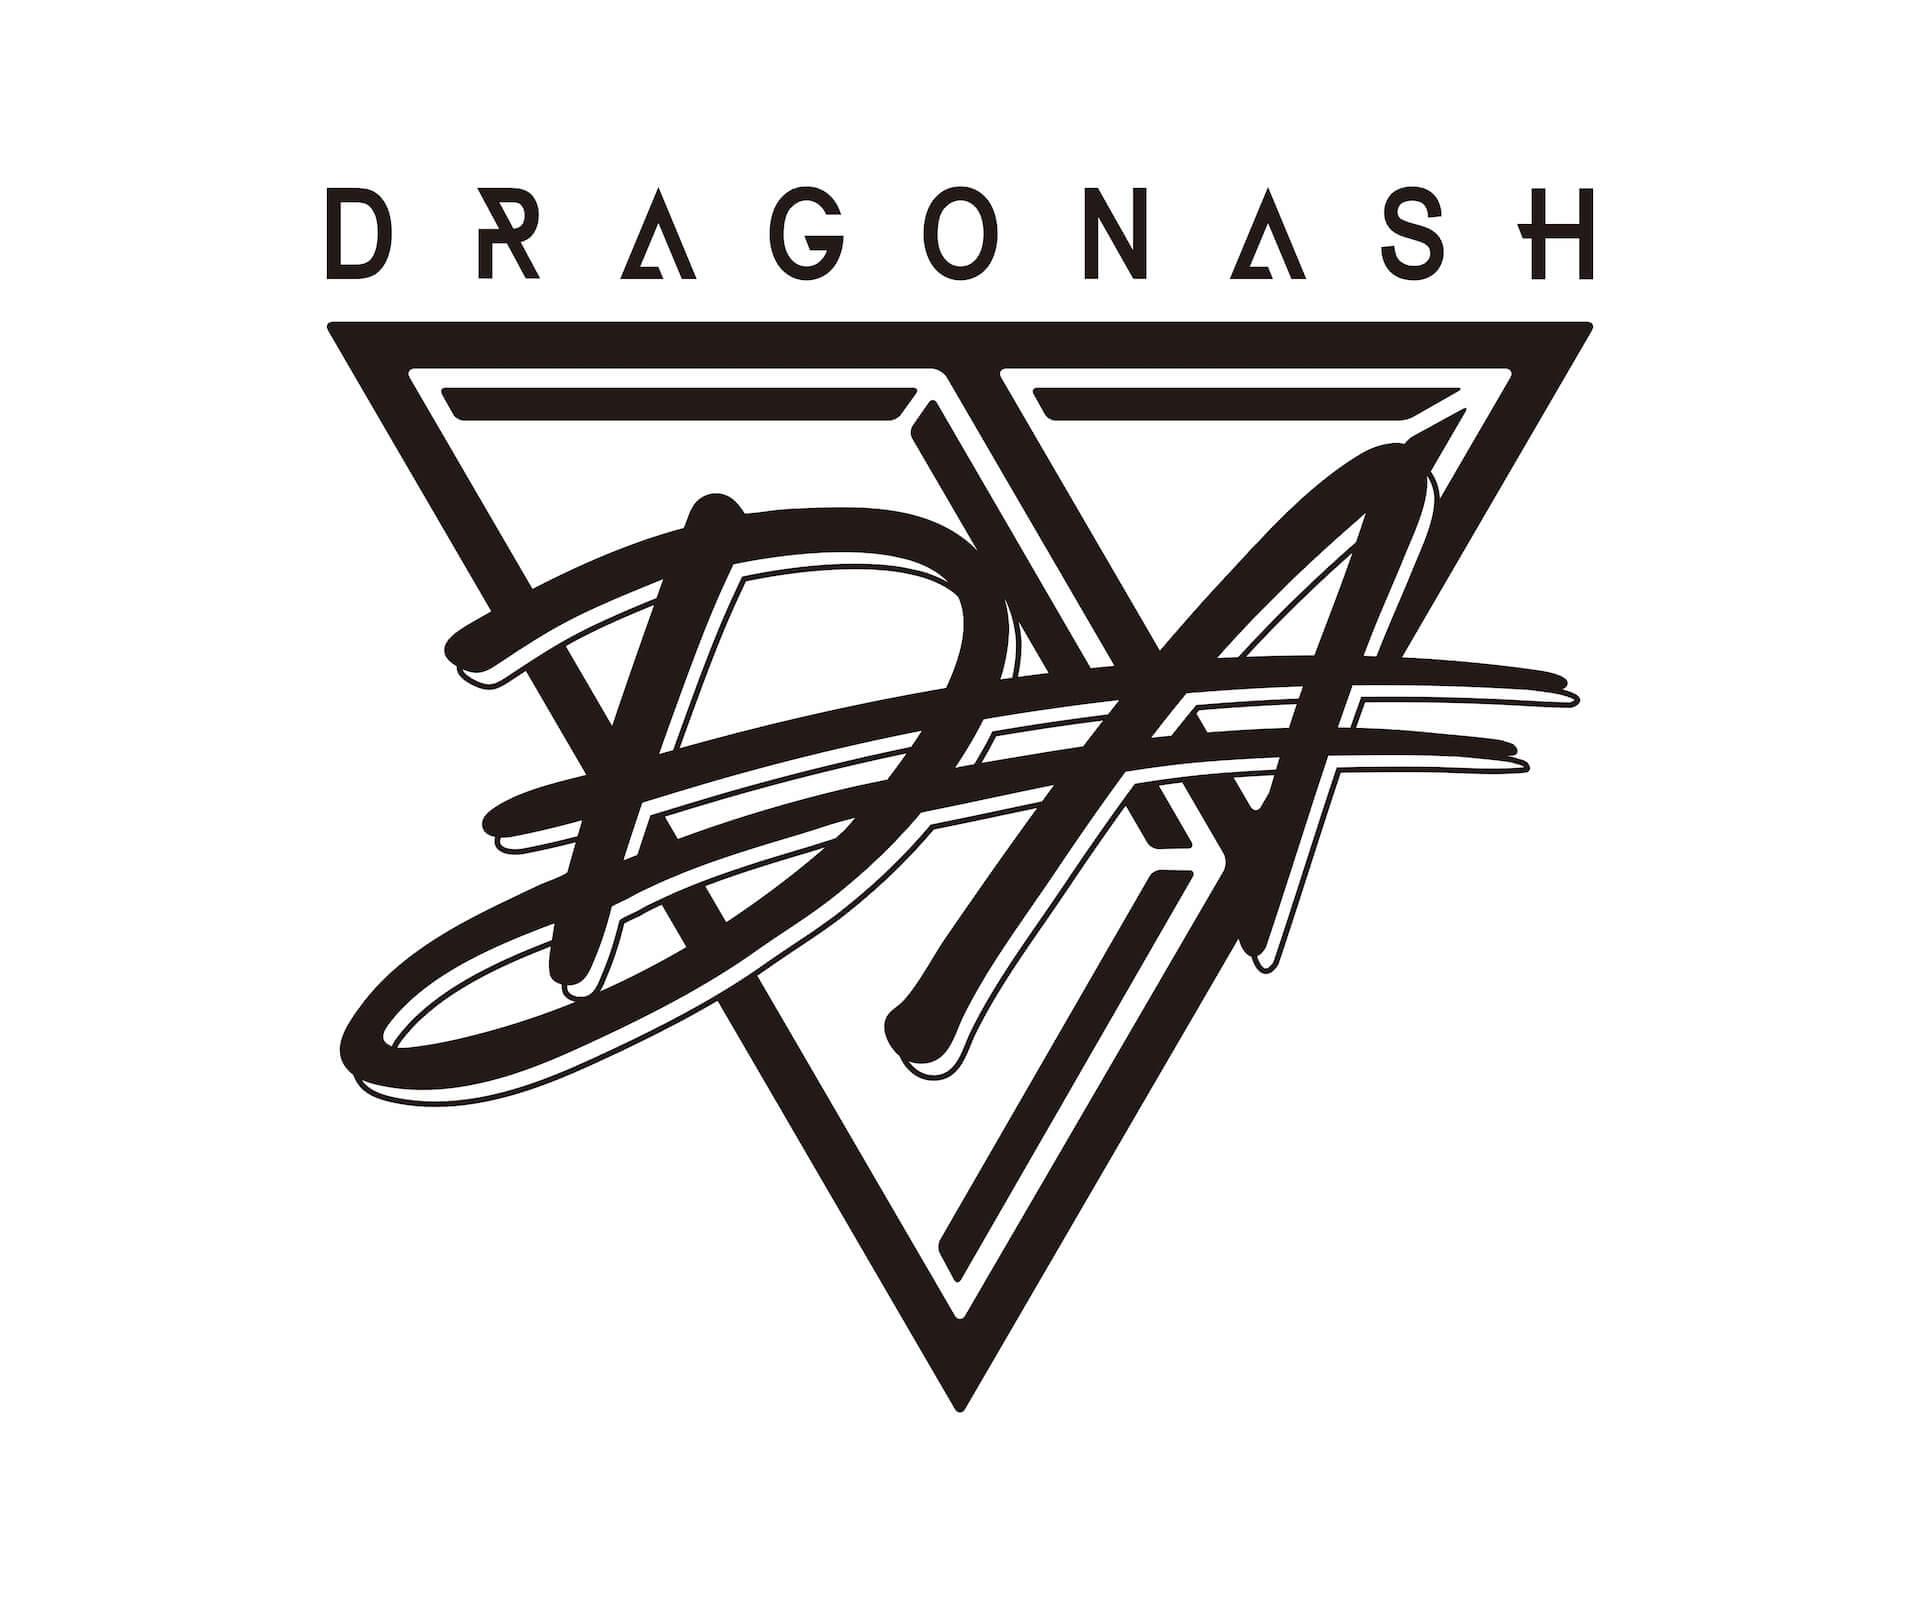 <GREENROOM FESTIVAL'20>第3弾アーティスト&日割り情報発表!Dragon Ash、幾何学模様、KANDYTOWNが登場 music200312_greenroom_03